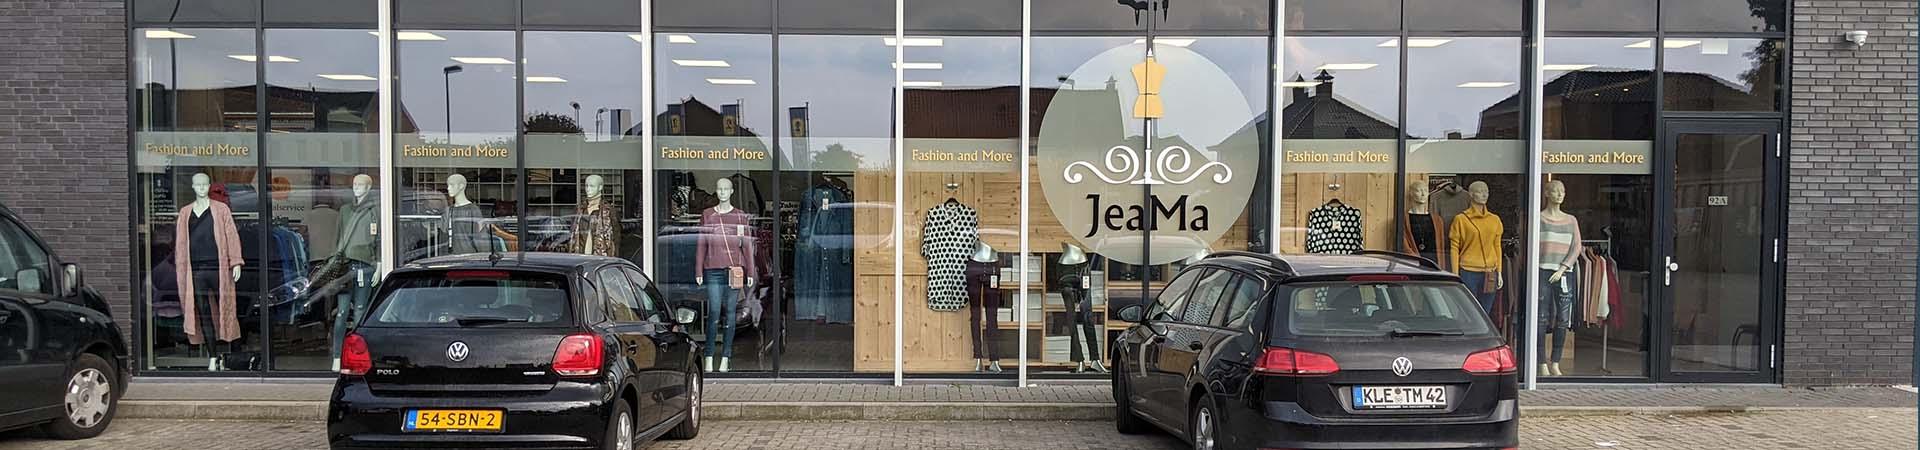 JeaMa Fashion and More Siebengewald